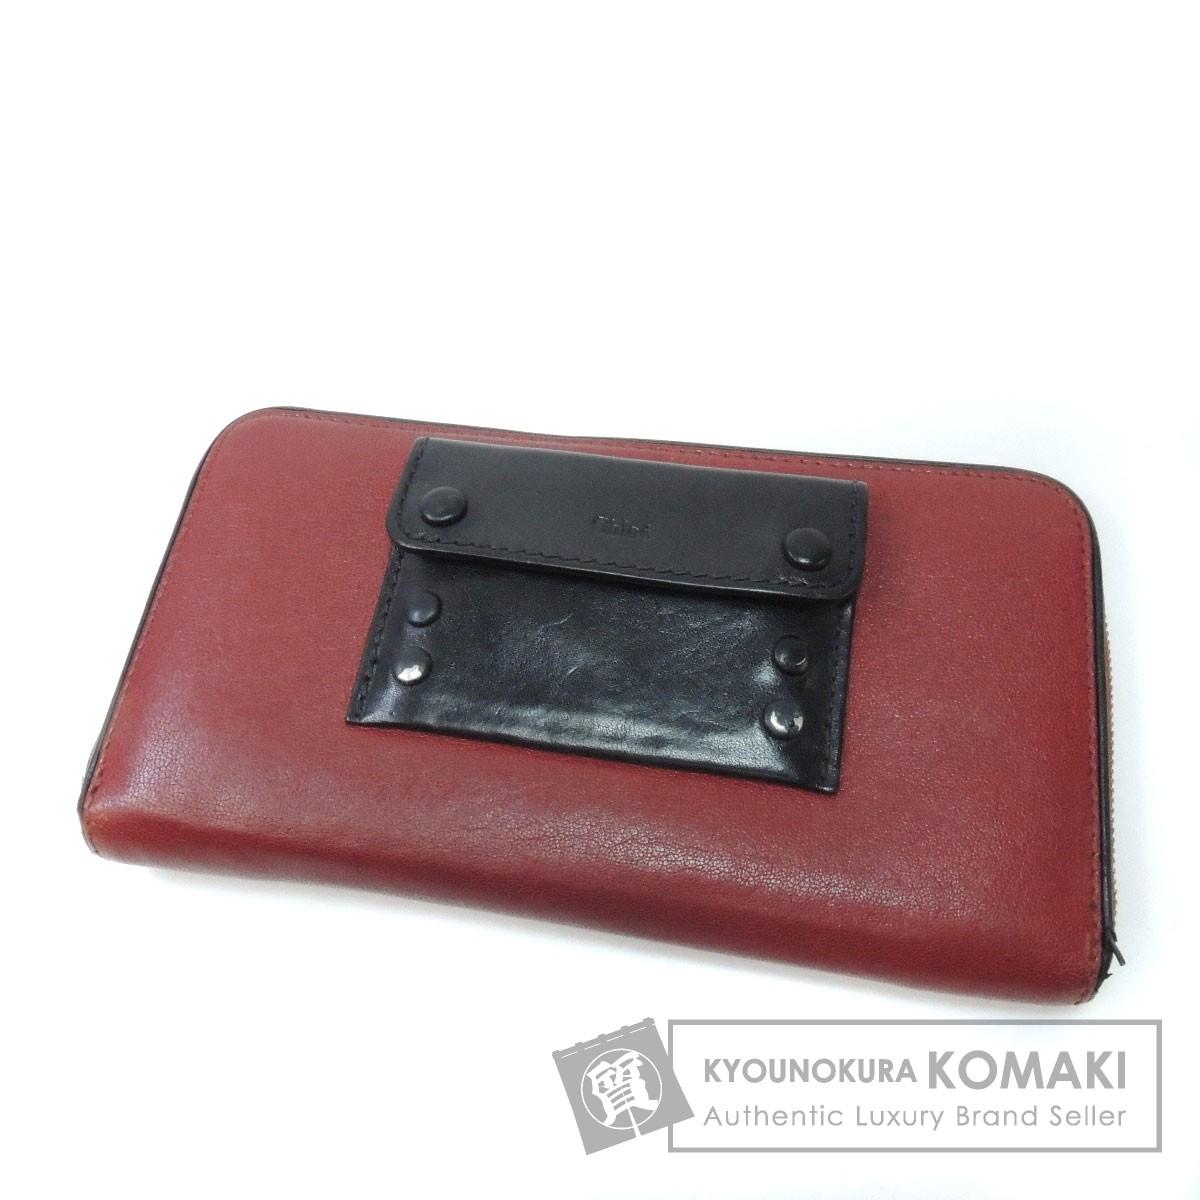 CHLOE ロゴ型押し 長財布(小銭入れあり) カーフ レディース 【中古】【クロエ】